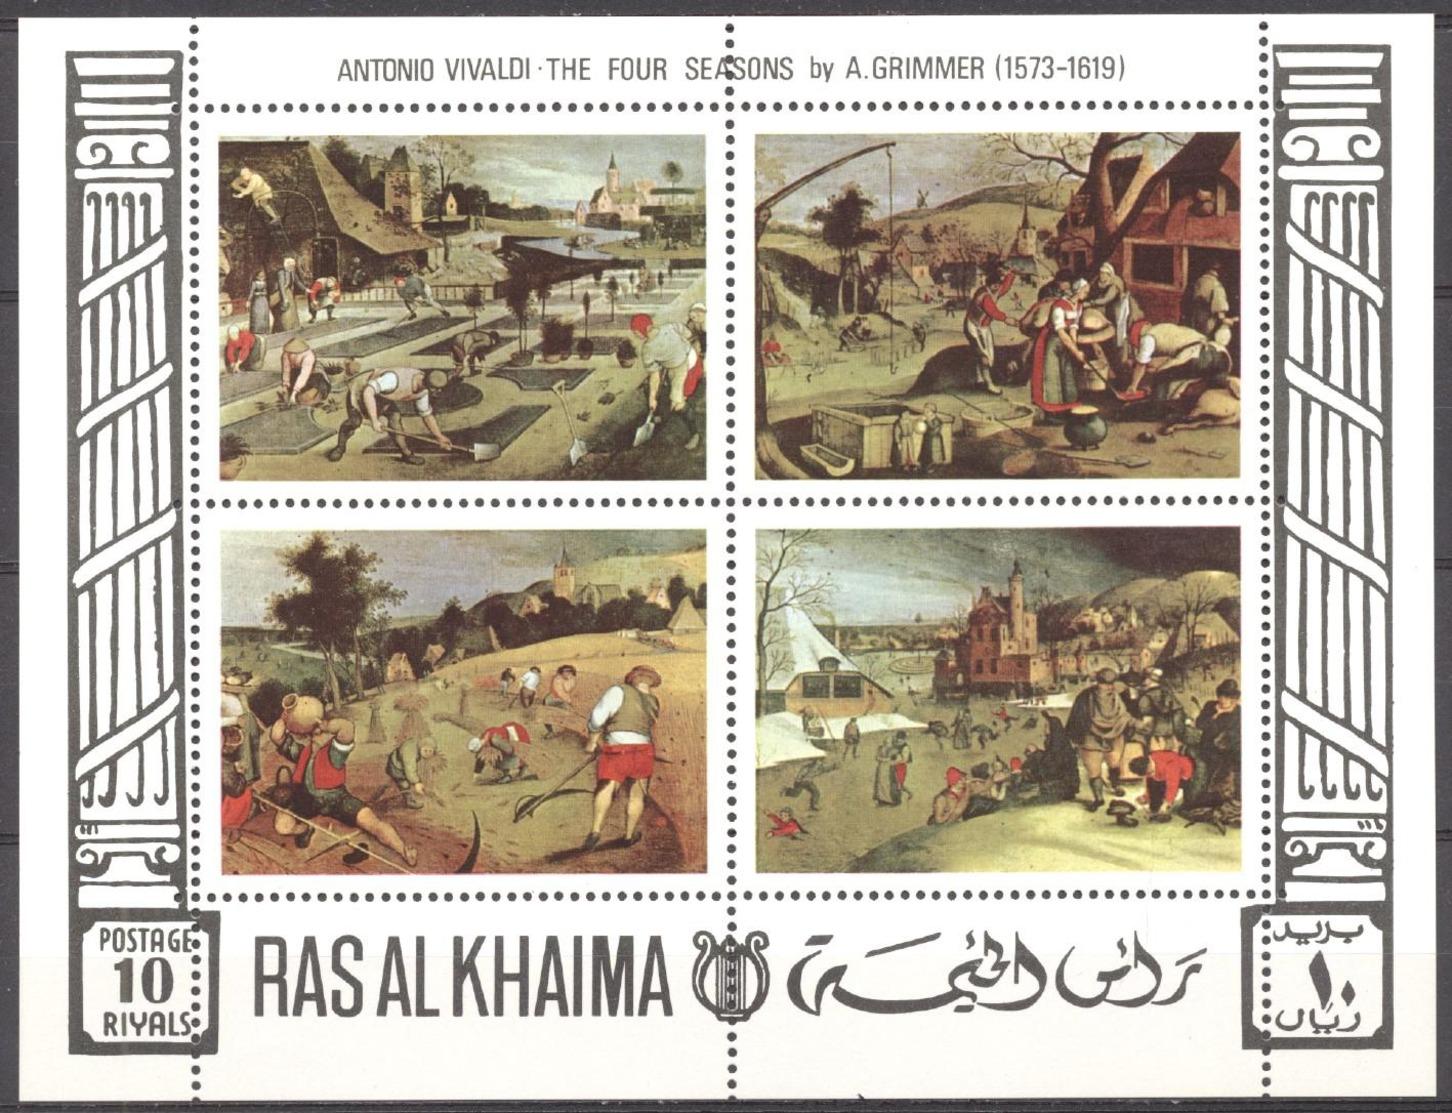 Ras Al Khaima 1971 - MNH - Art, Composer, Vivaldi (275214) - Ohne Zuordnung